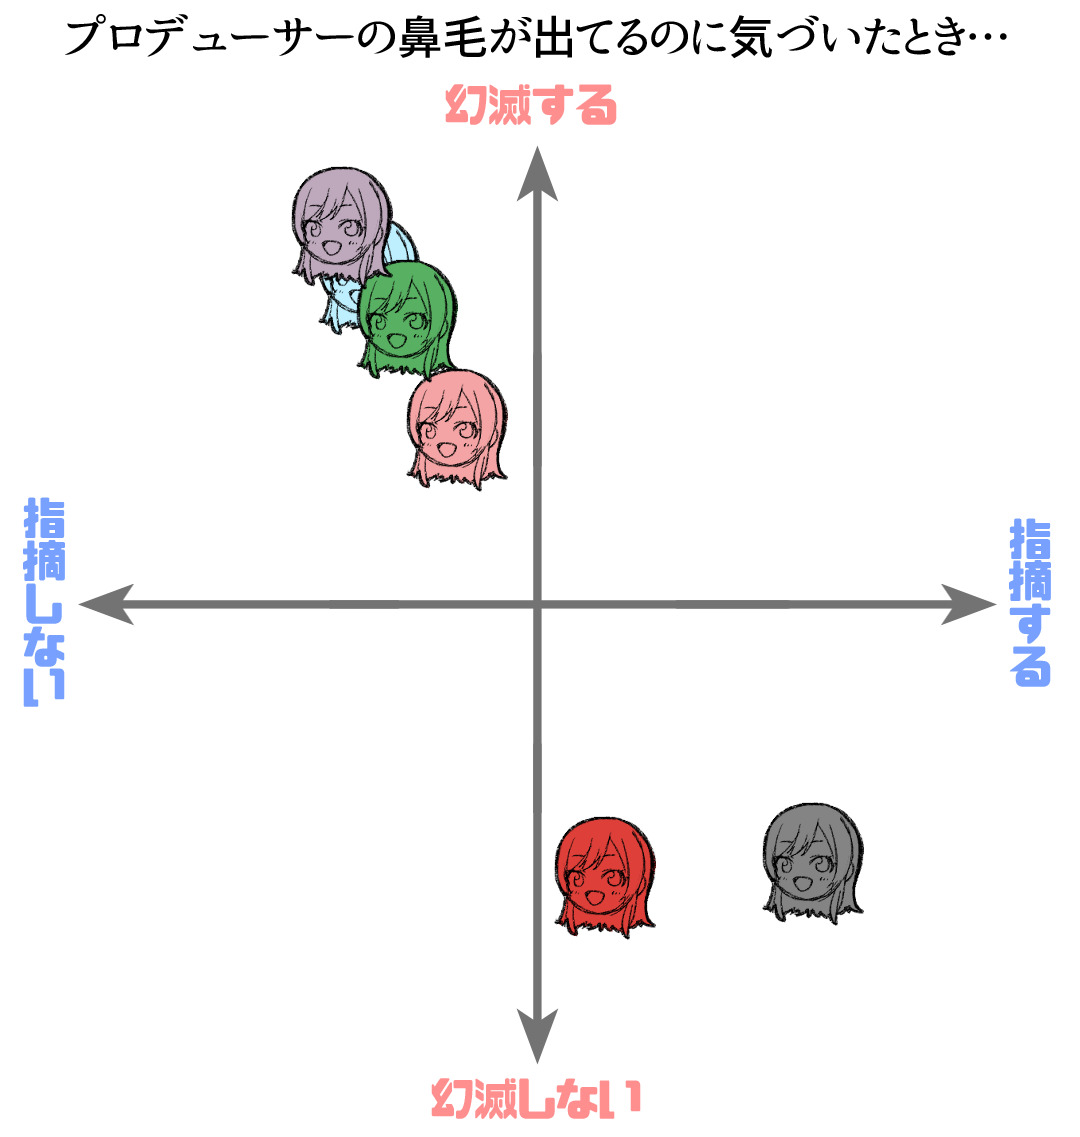 f:id:hoshi_sano:20200414113600j:image:w400